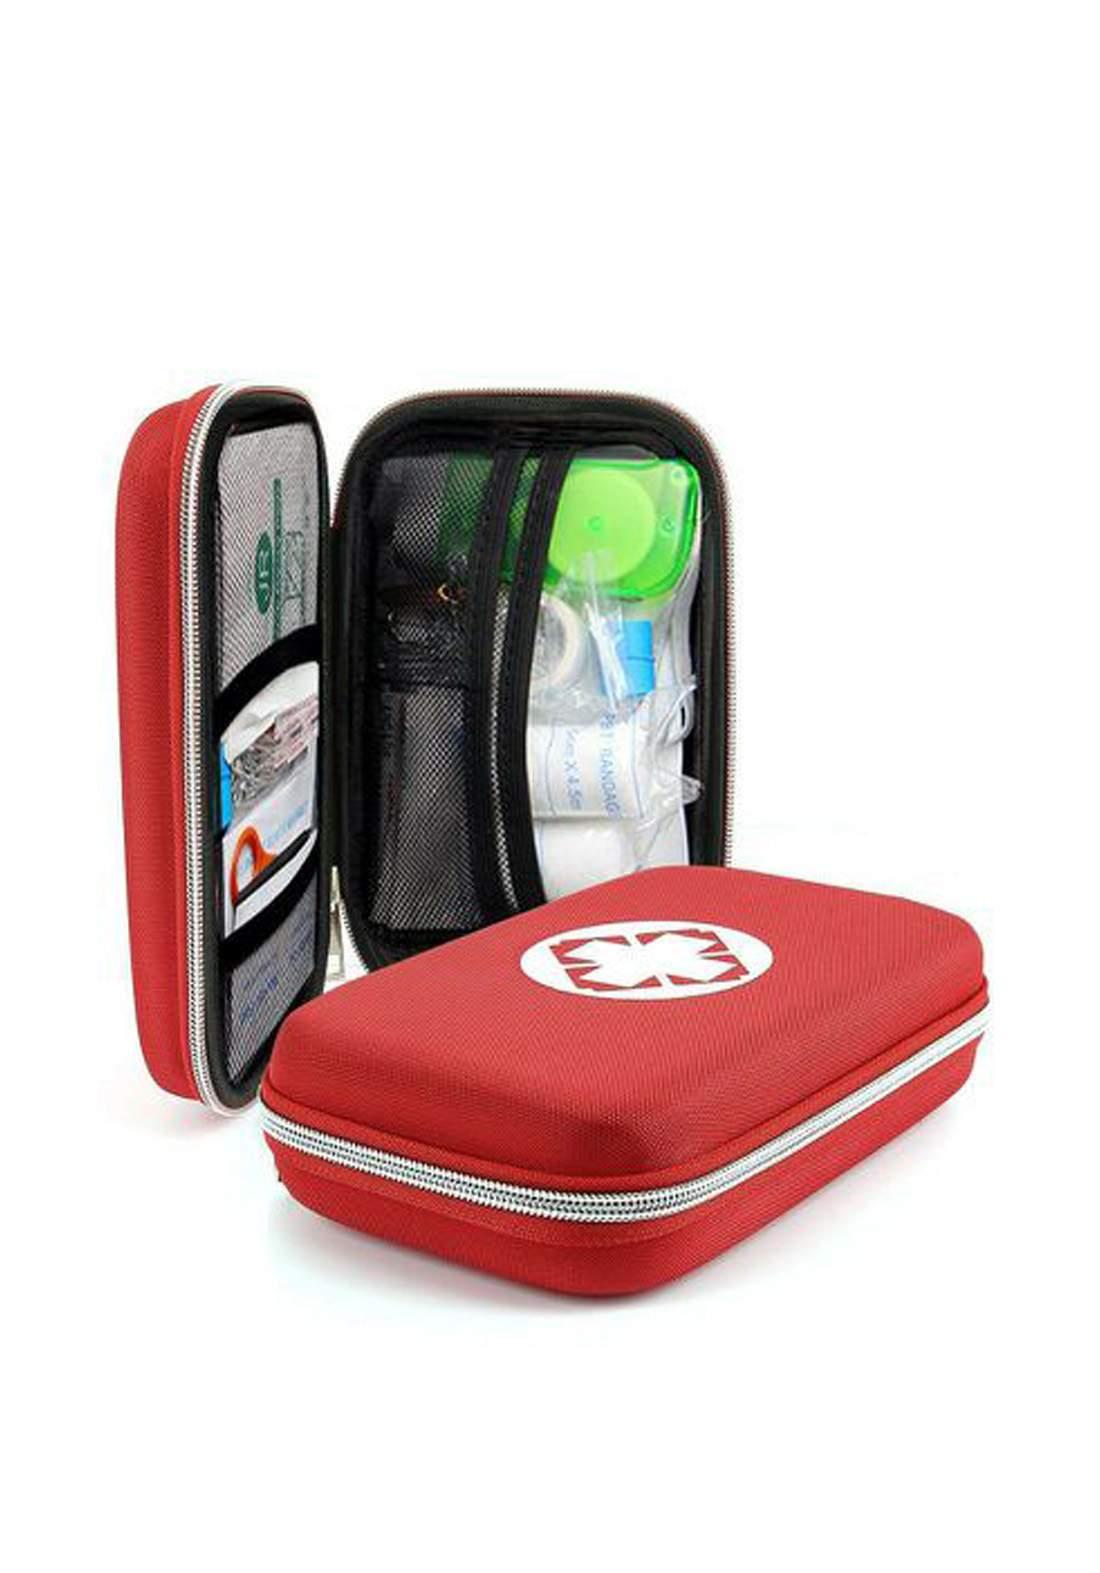 Subul AlHurra First Aid Kit صندوق اسعافات اولية